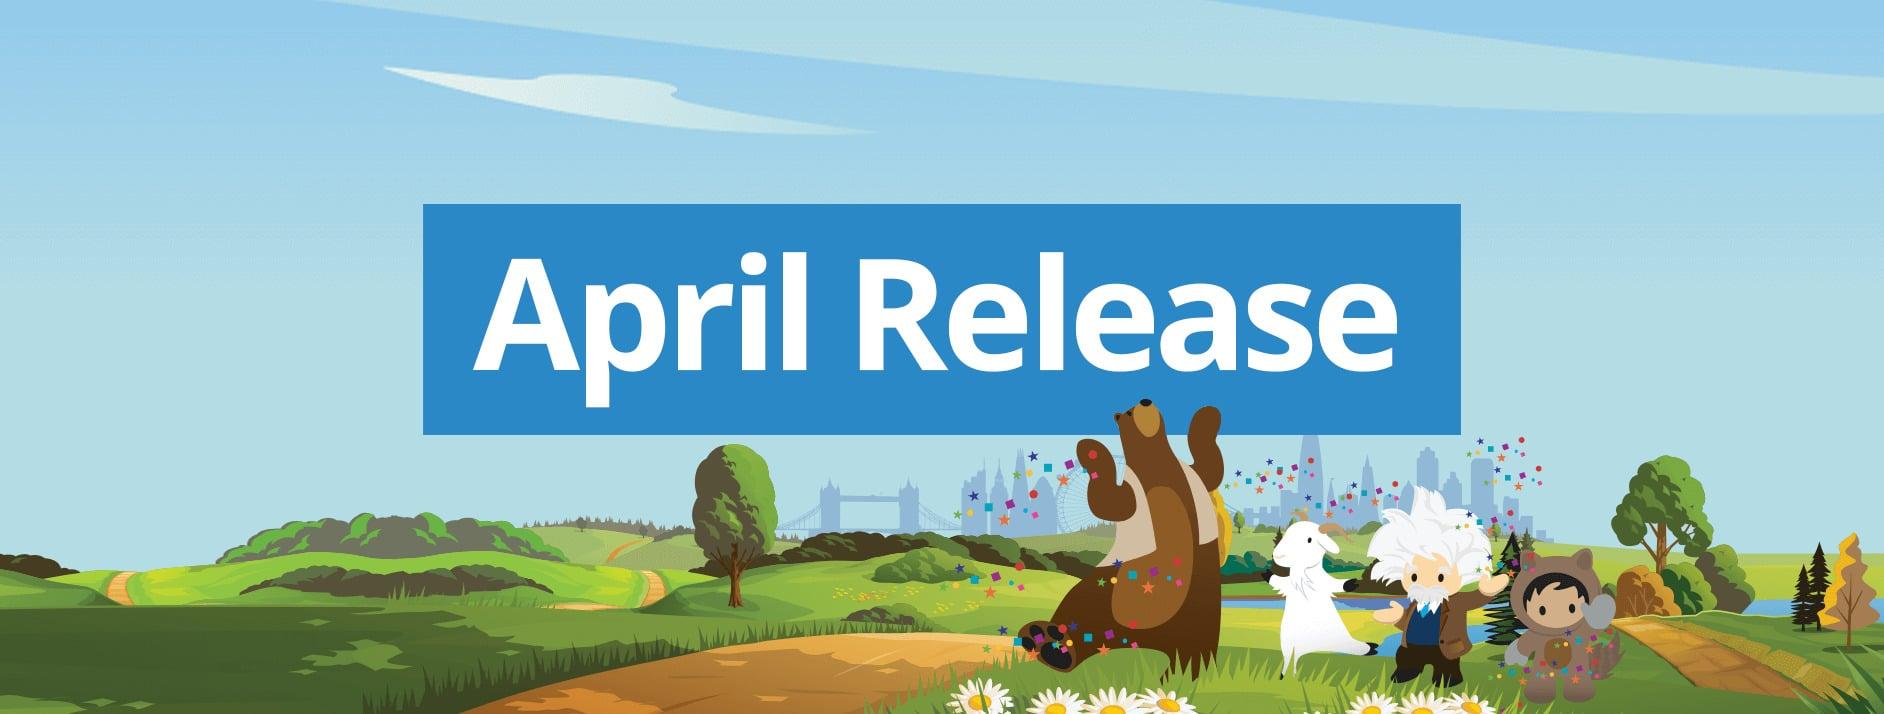 Netive VMS release april 2020